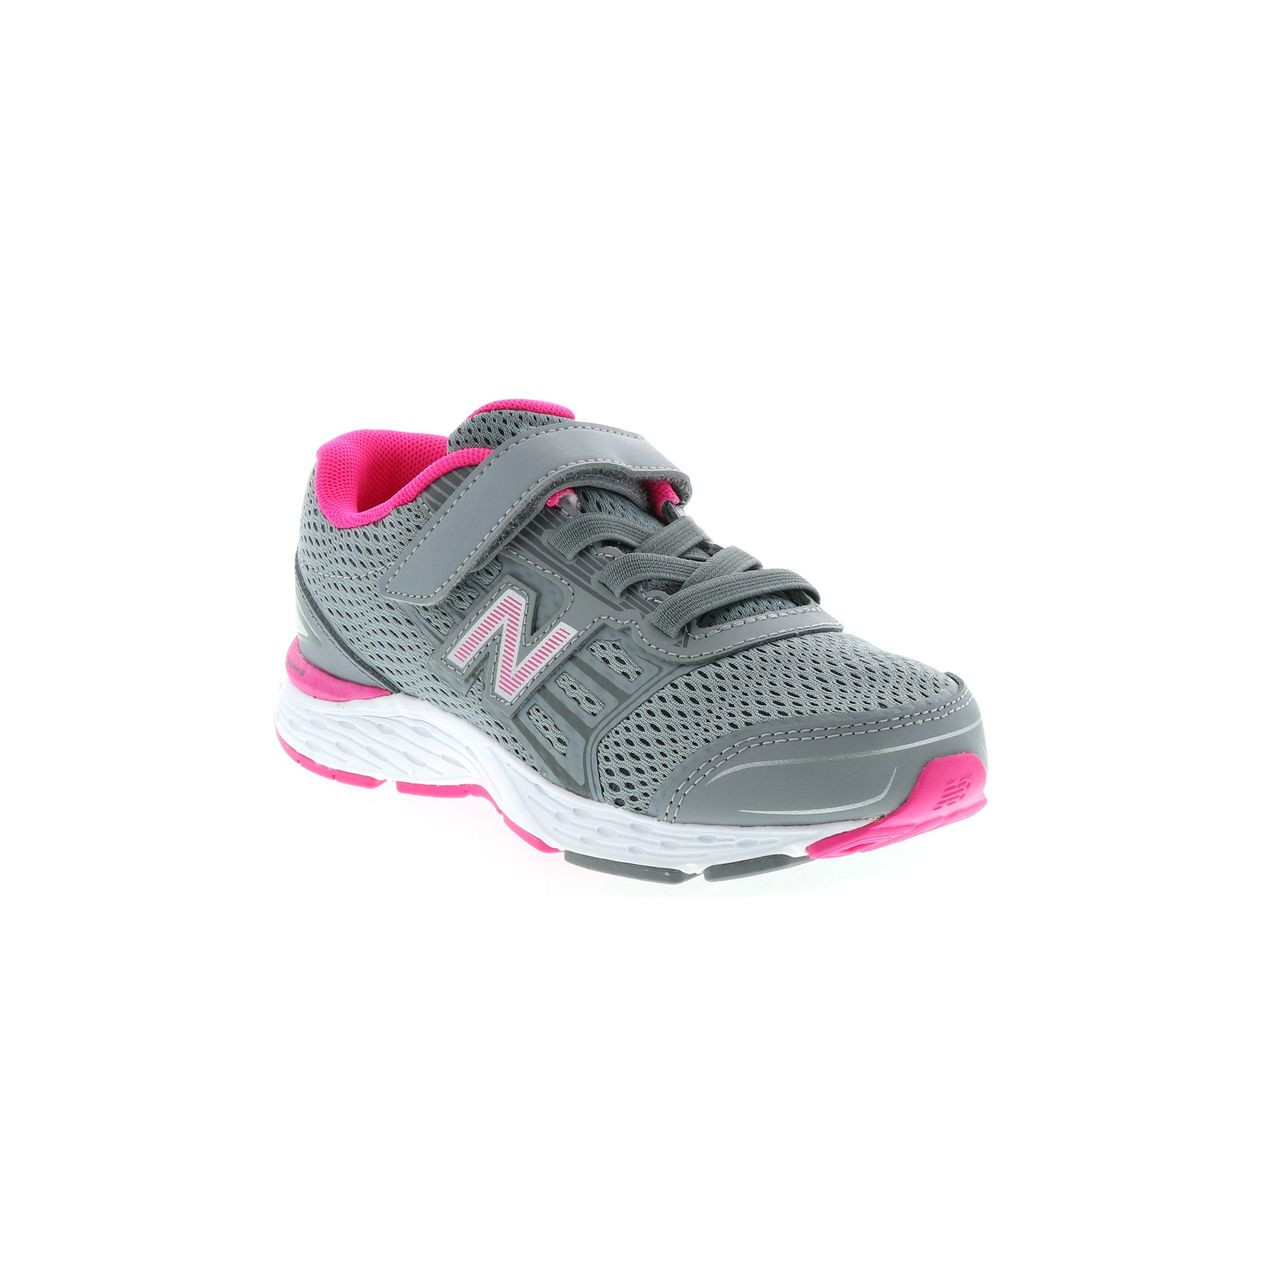 44e1b50d Kids New Balance Girls KA680SSY Leather Low Top Lace Up Running  Sneaker~pp-18cfa9b0